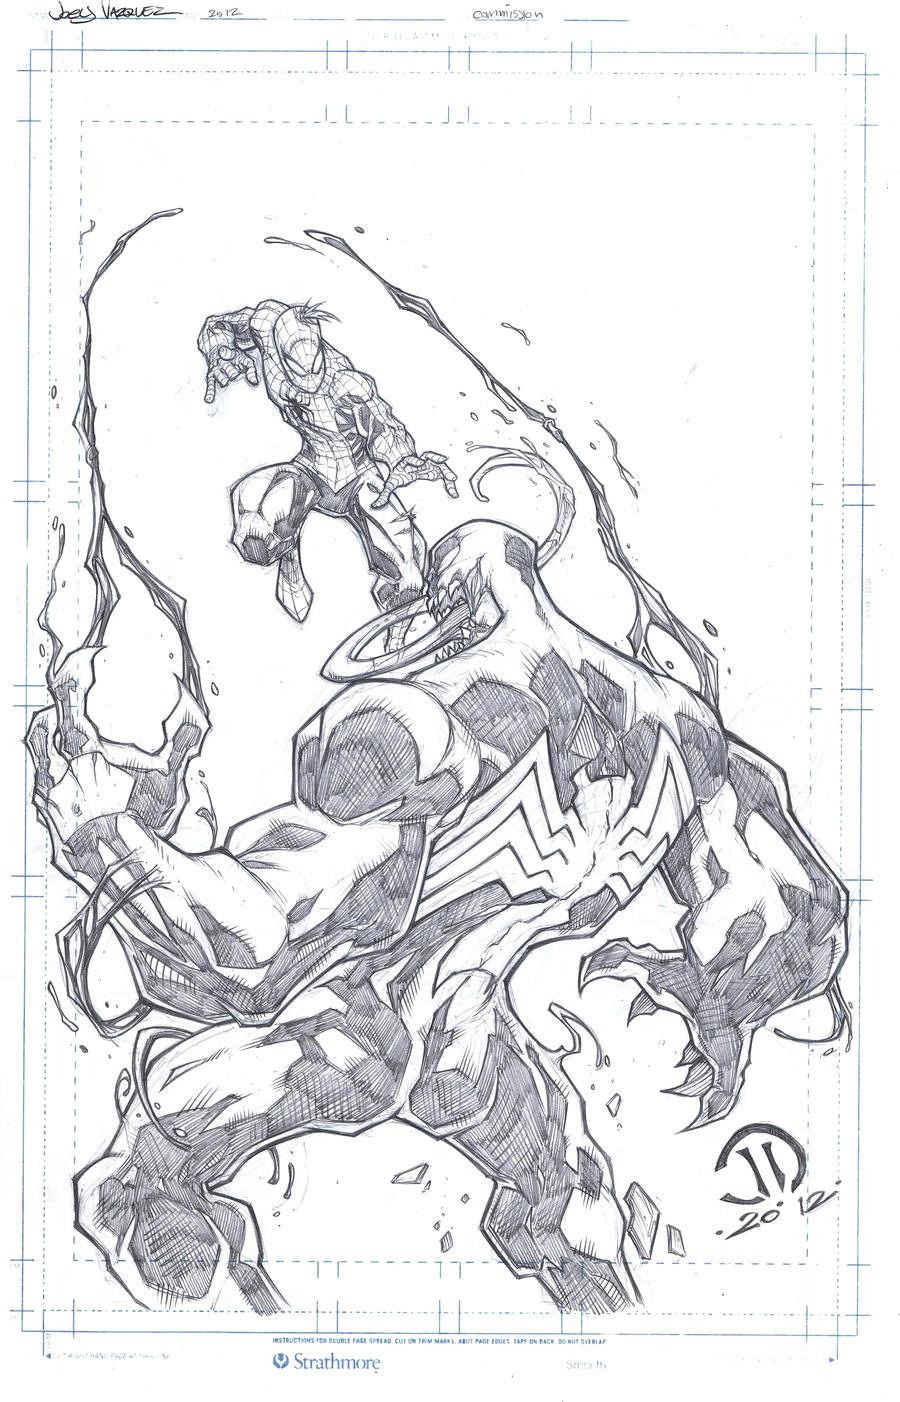 Spiderman vs Venom commission pencils by JoeyVazquez